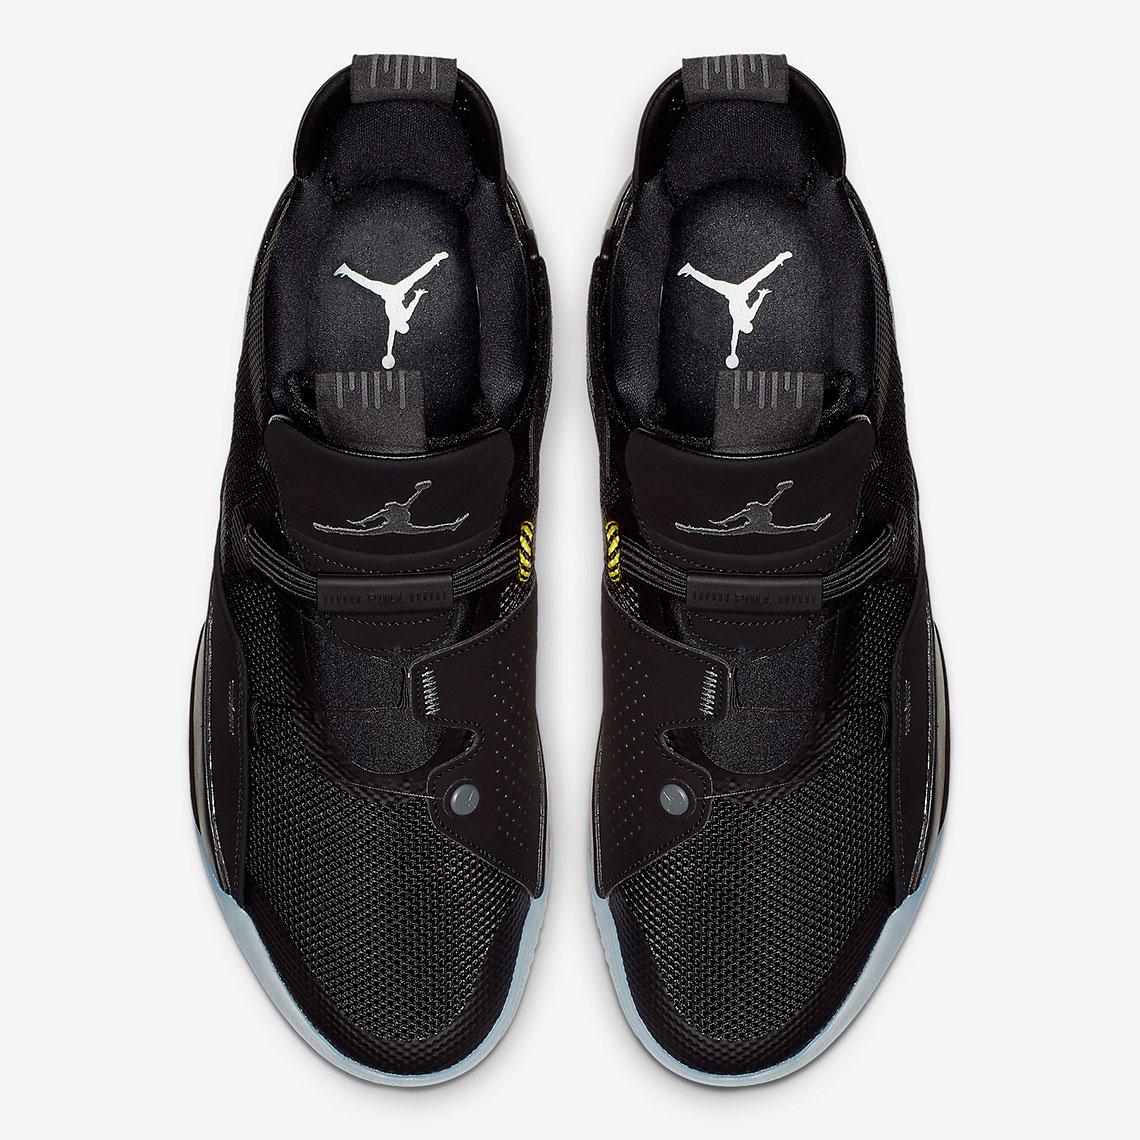 best website 9c529 58461 The Air Jordan 33